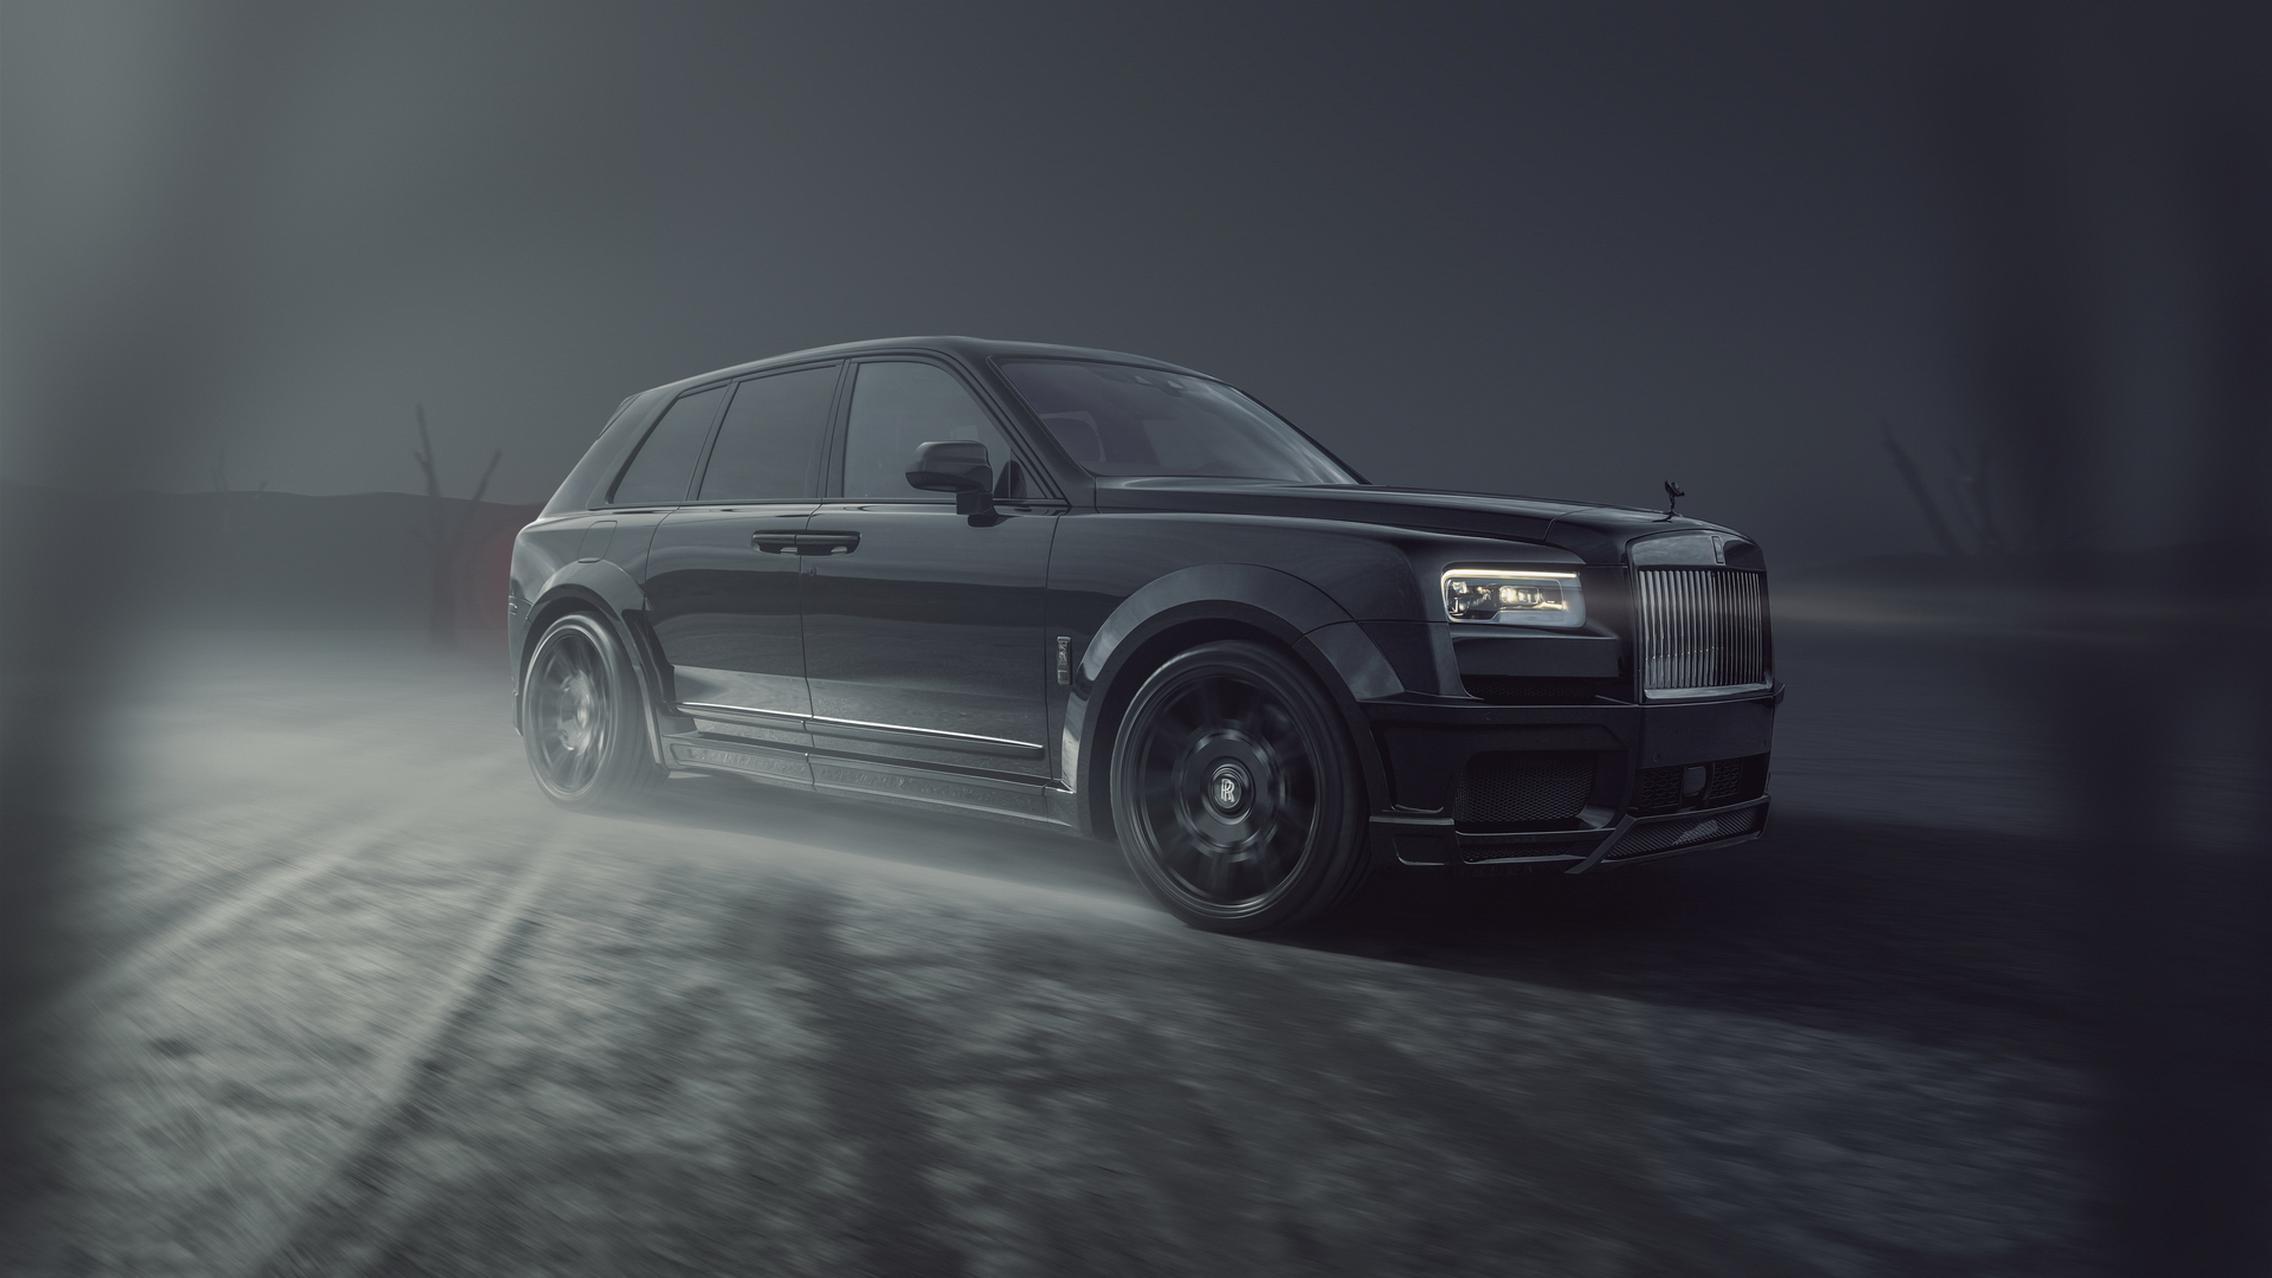 Widebody Rolls-Royce Cullinan